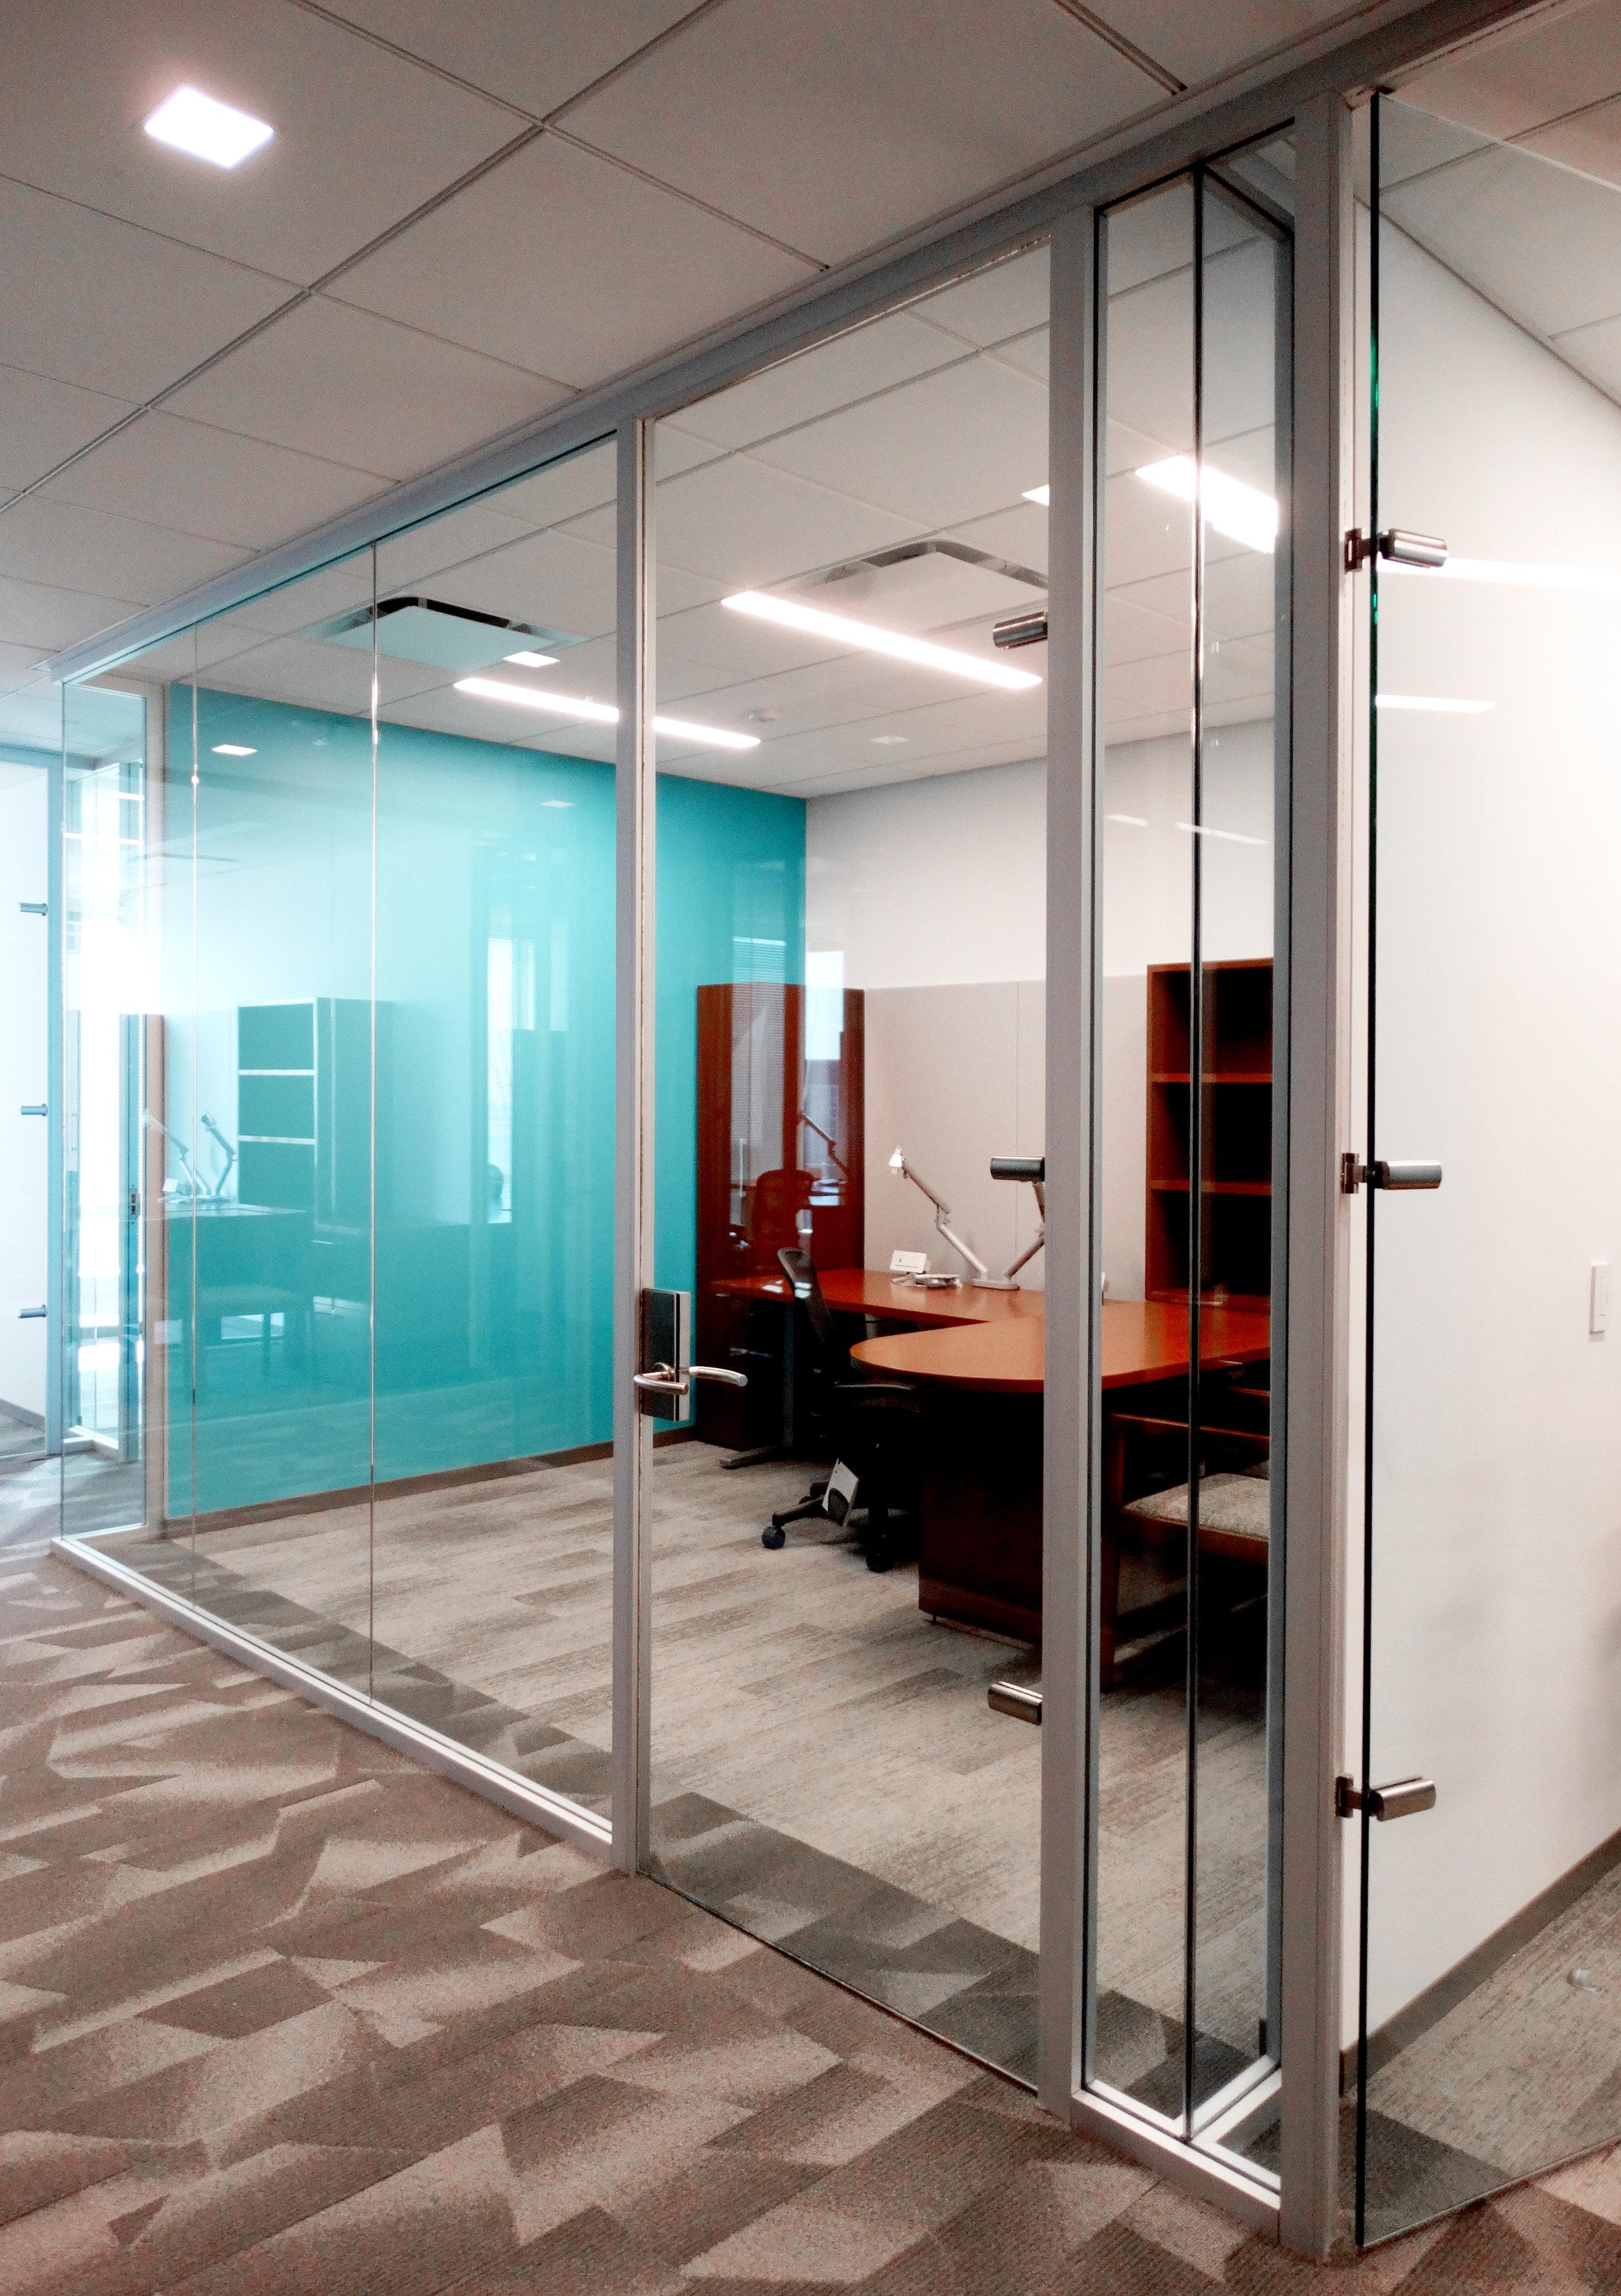 Litespace Glass Doors Aluminum Framed Wall - Spaceworks AI.jpg